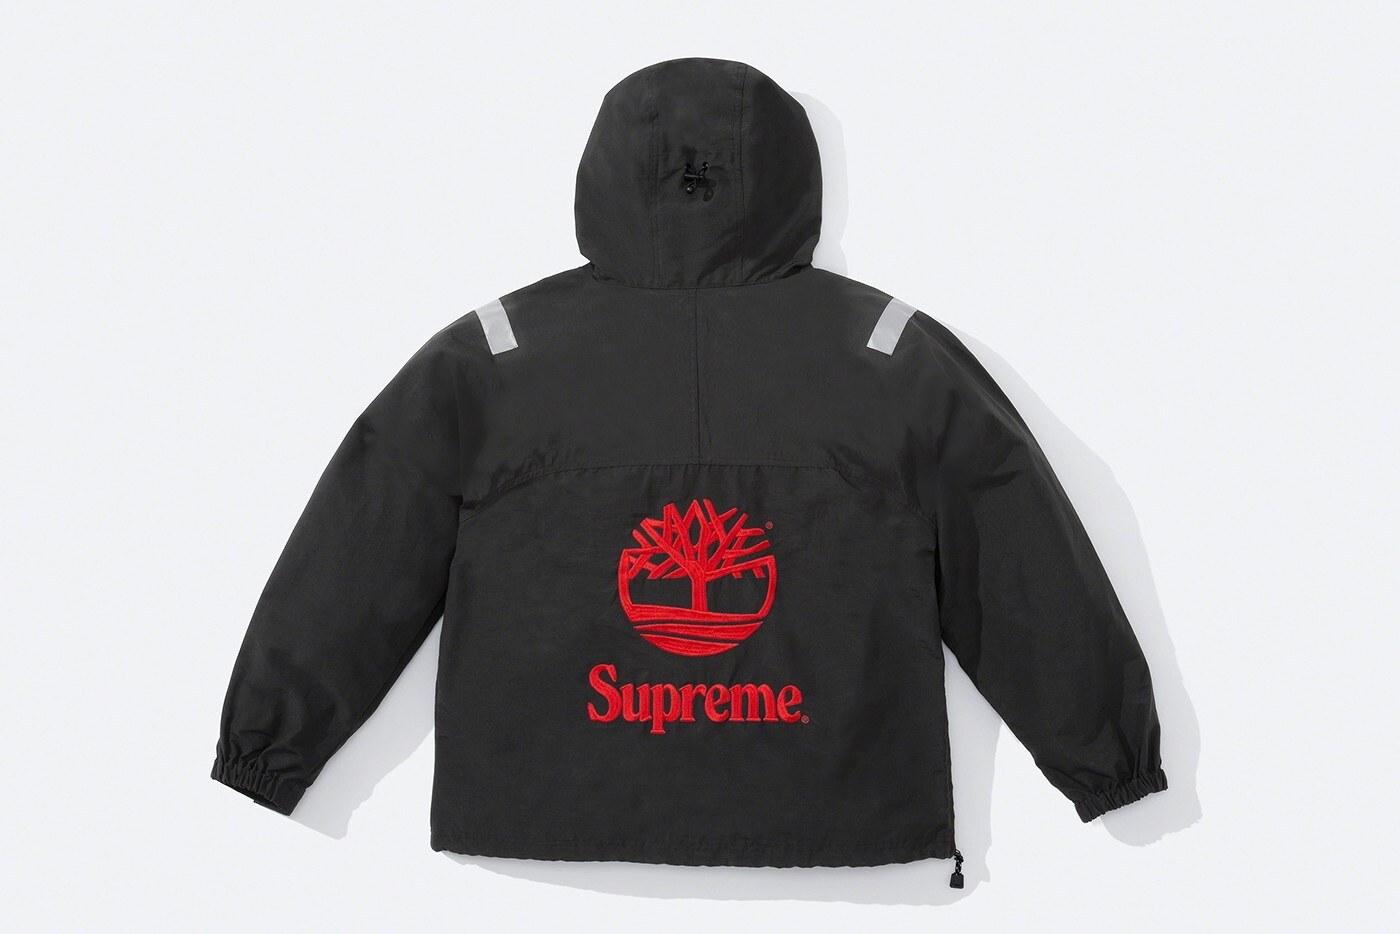 Timberland x Supreme Spring 2021